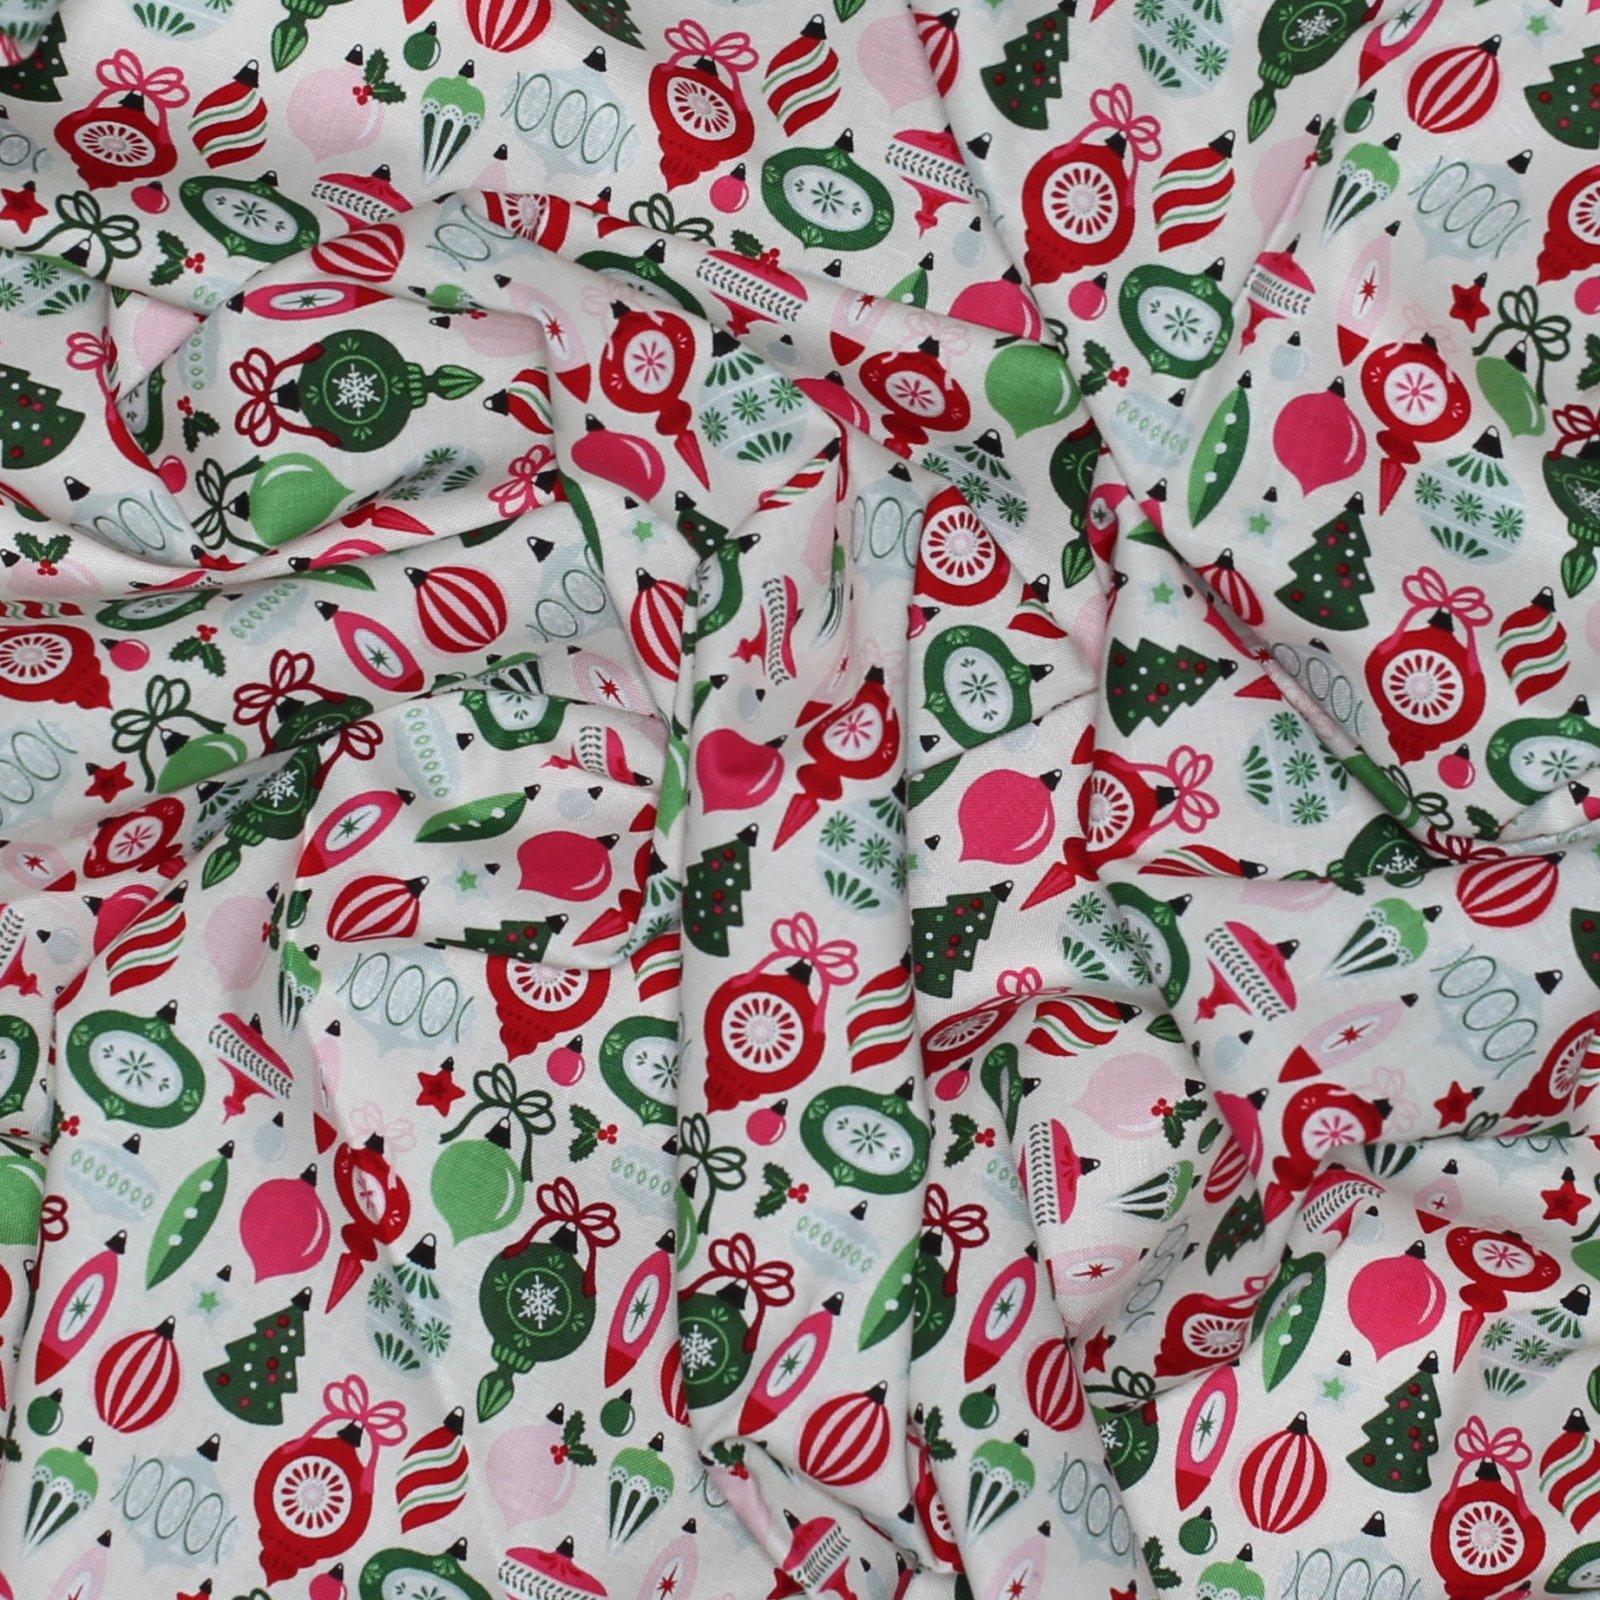 Merry And Bright Ornaments - Cream